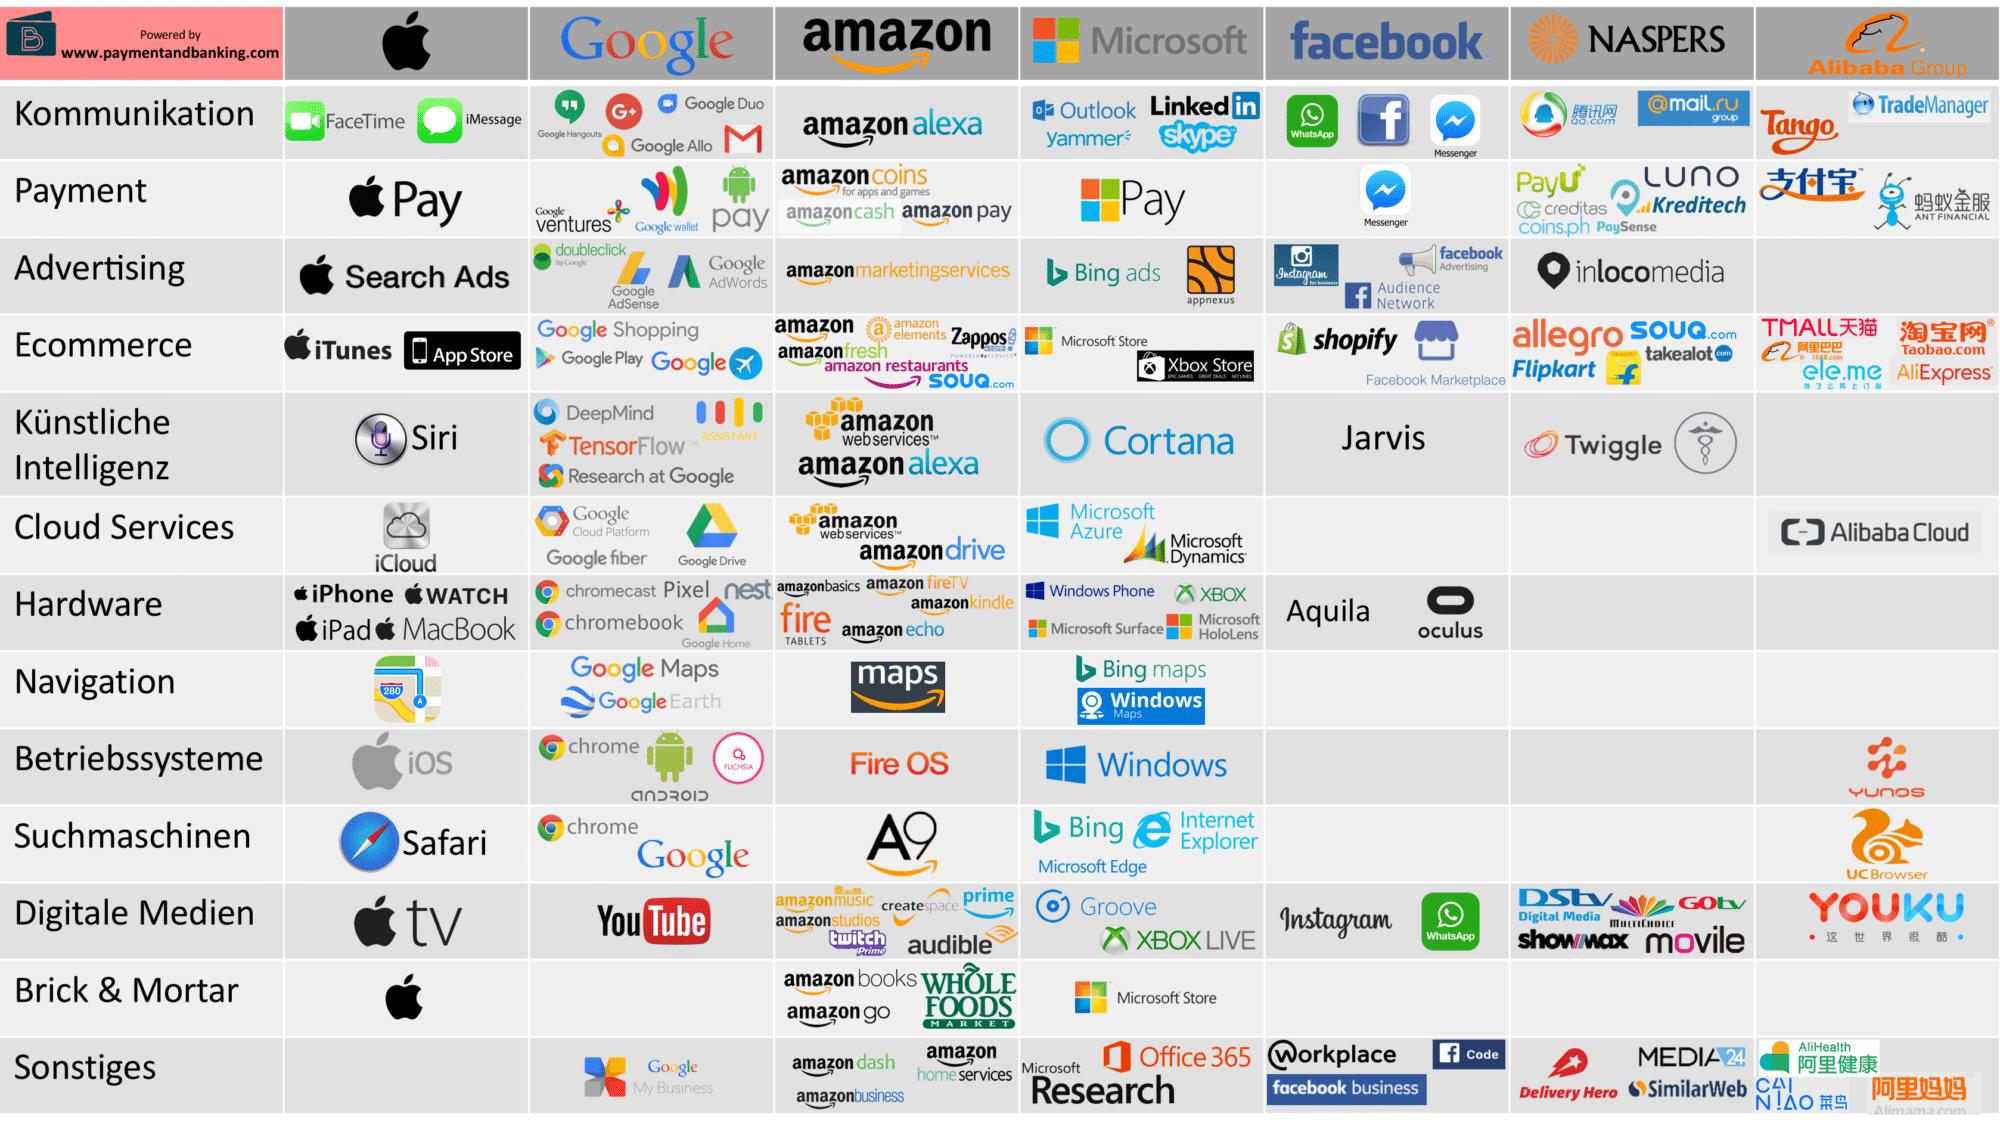 https://paymentandbanking.com/infografik-2-faktor-authentifizierung/